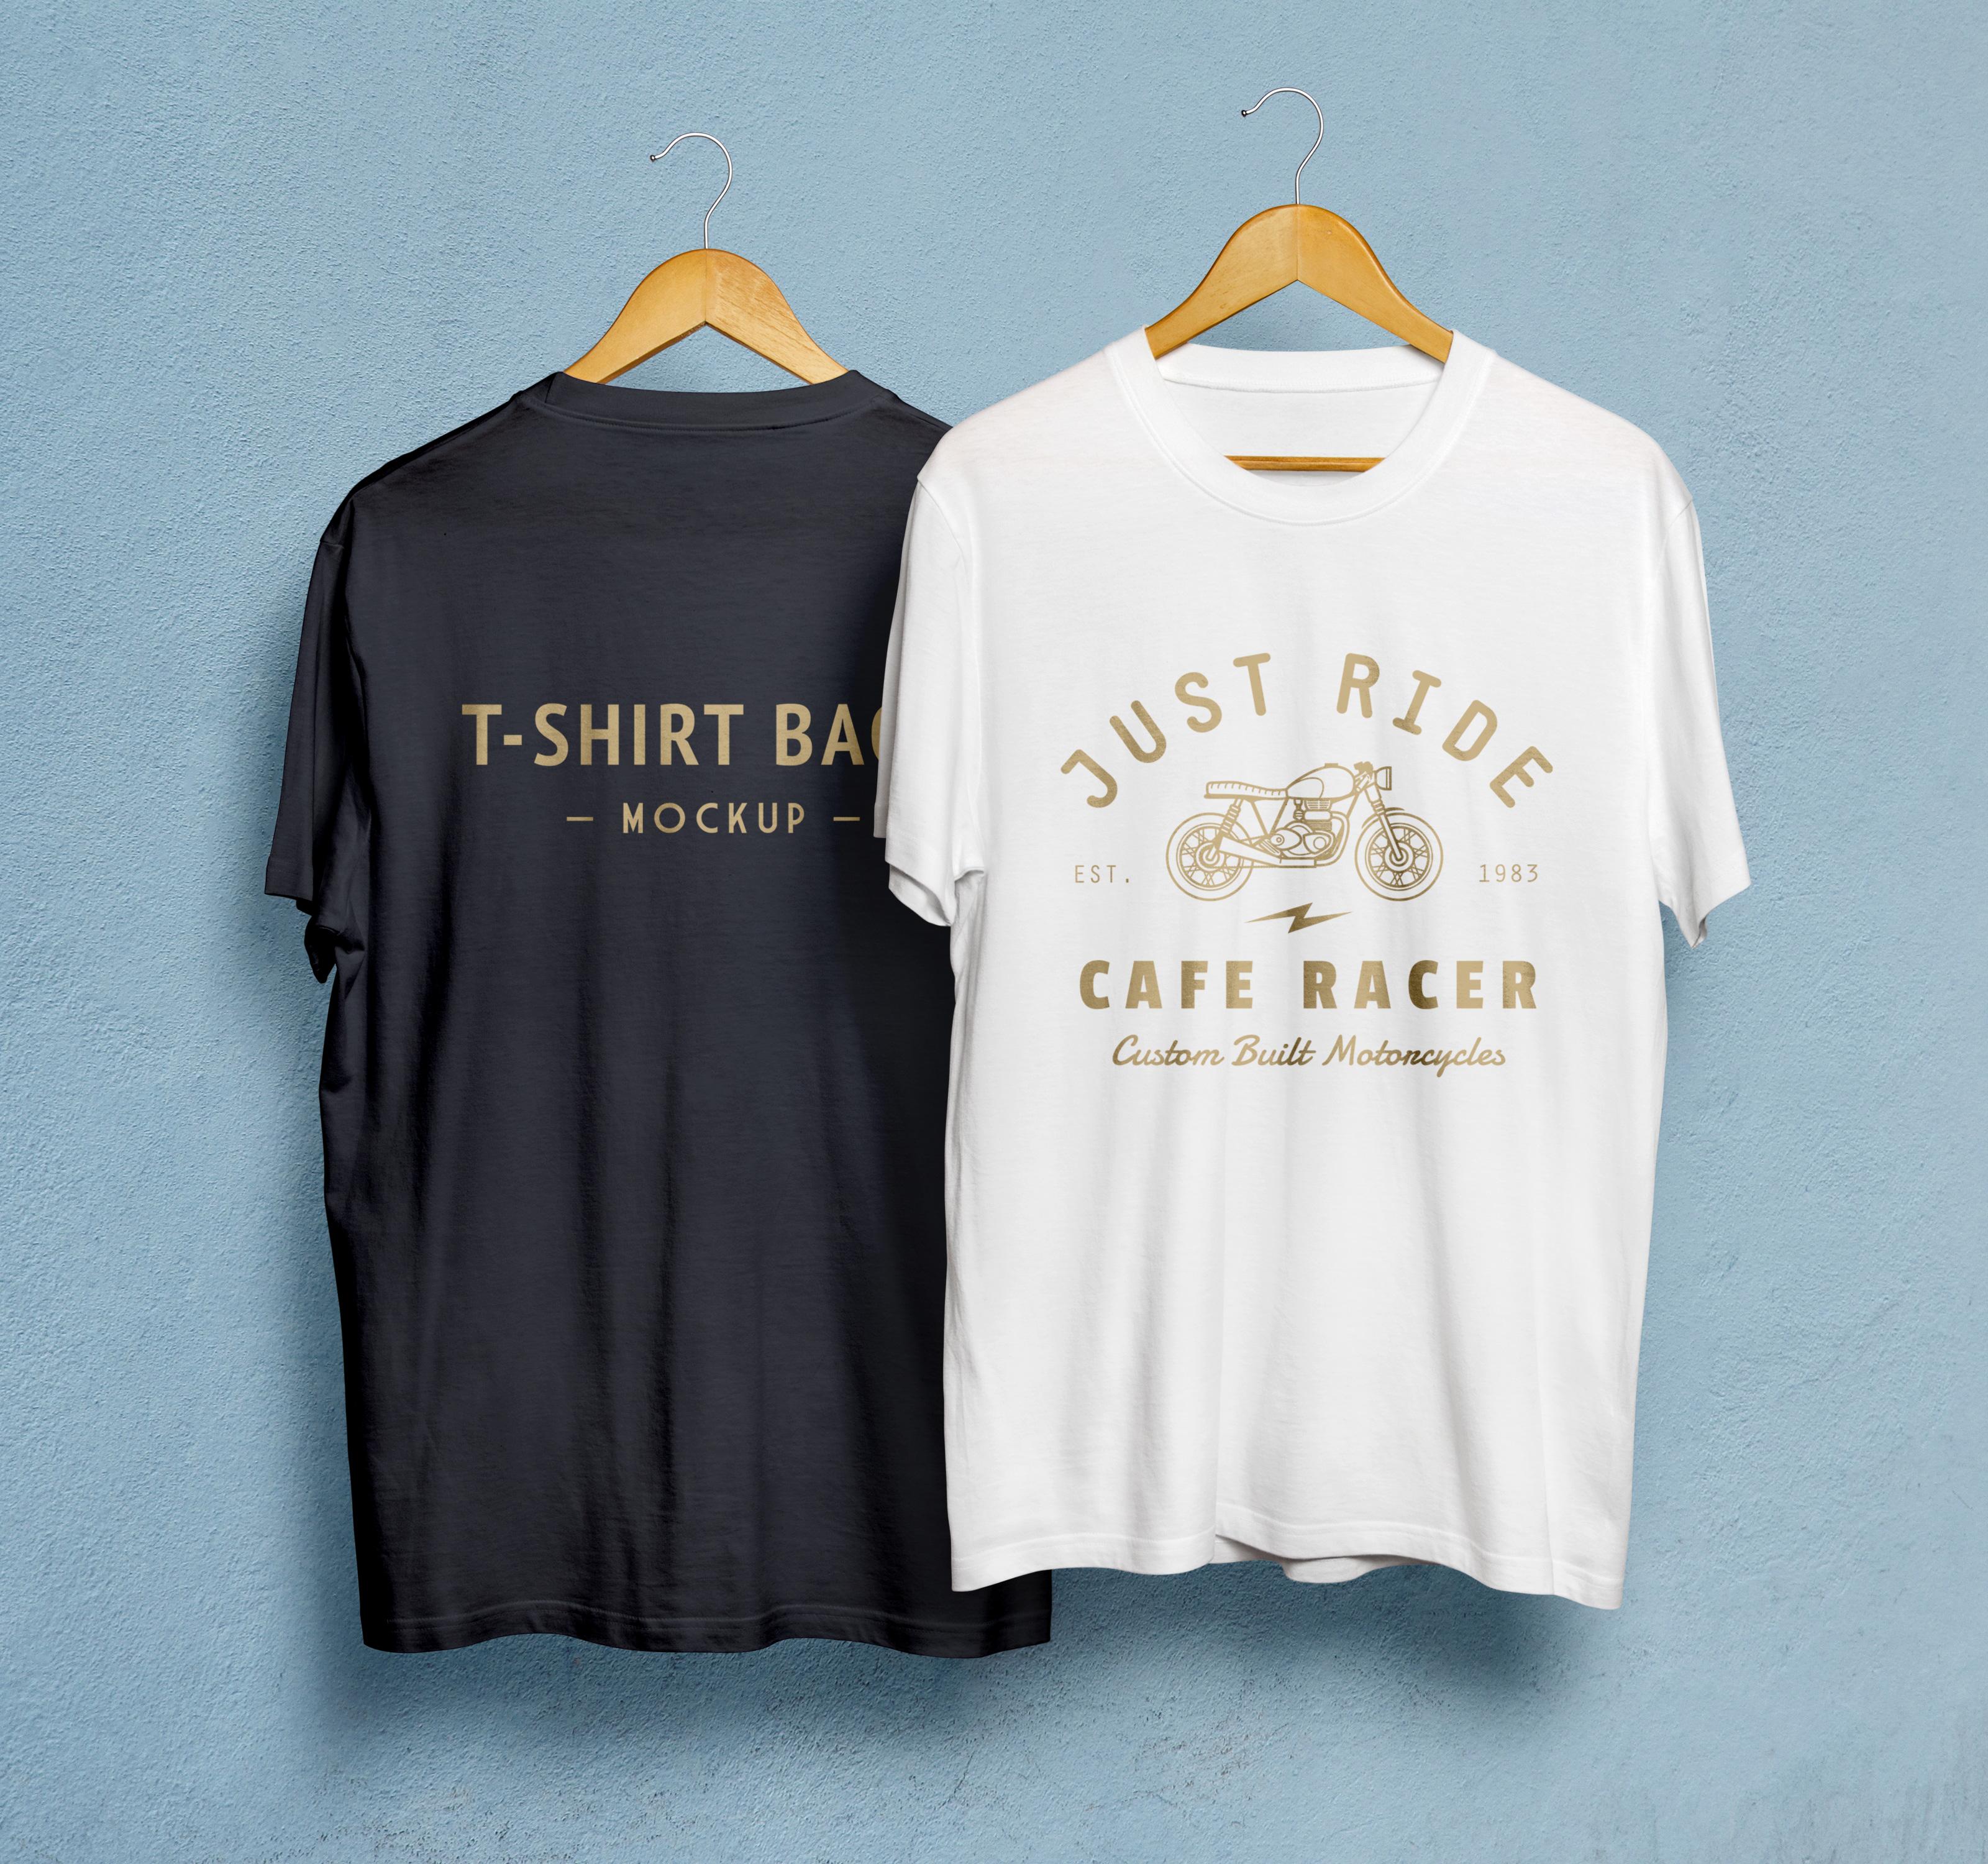 30 free and premium t shirt mockup psd templates webprecis for Mockup generator t shirt